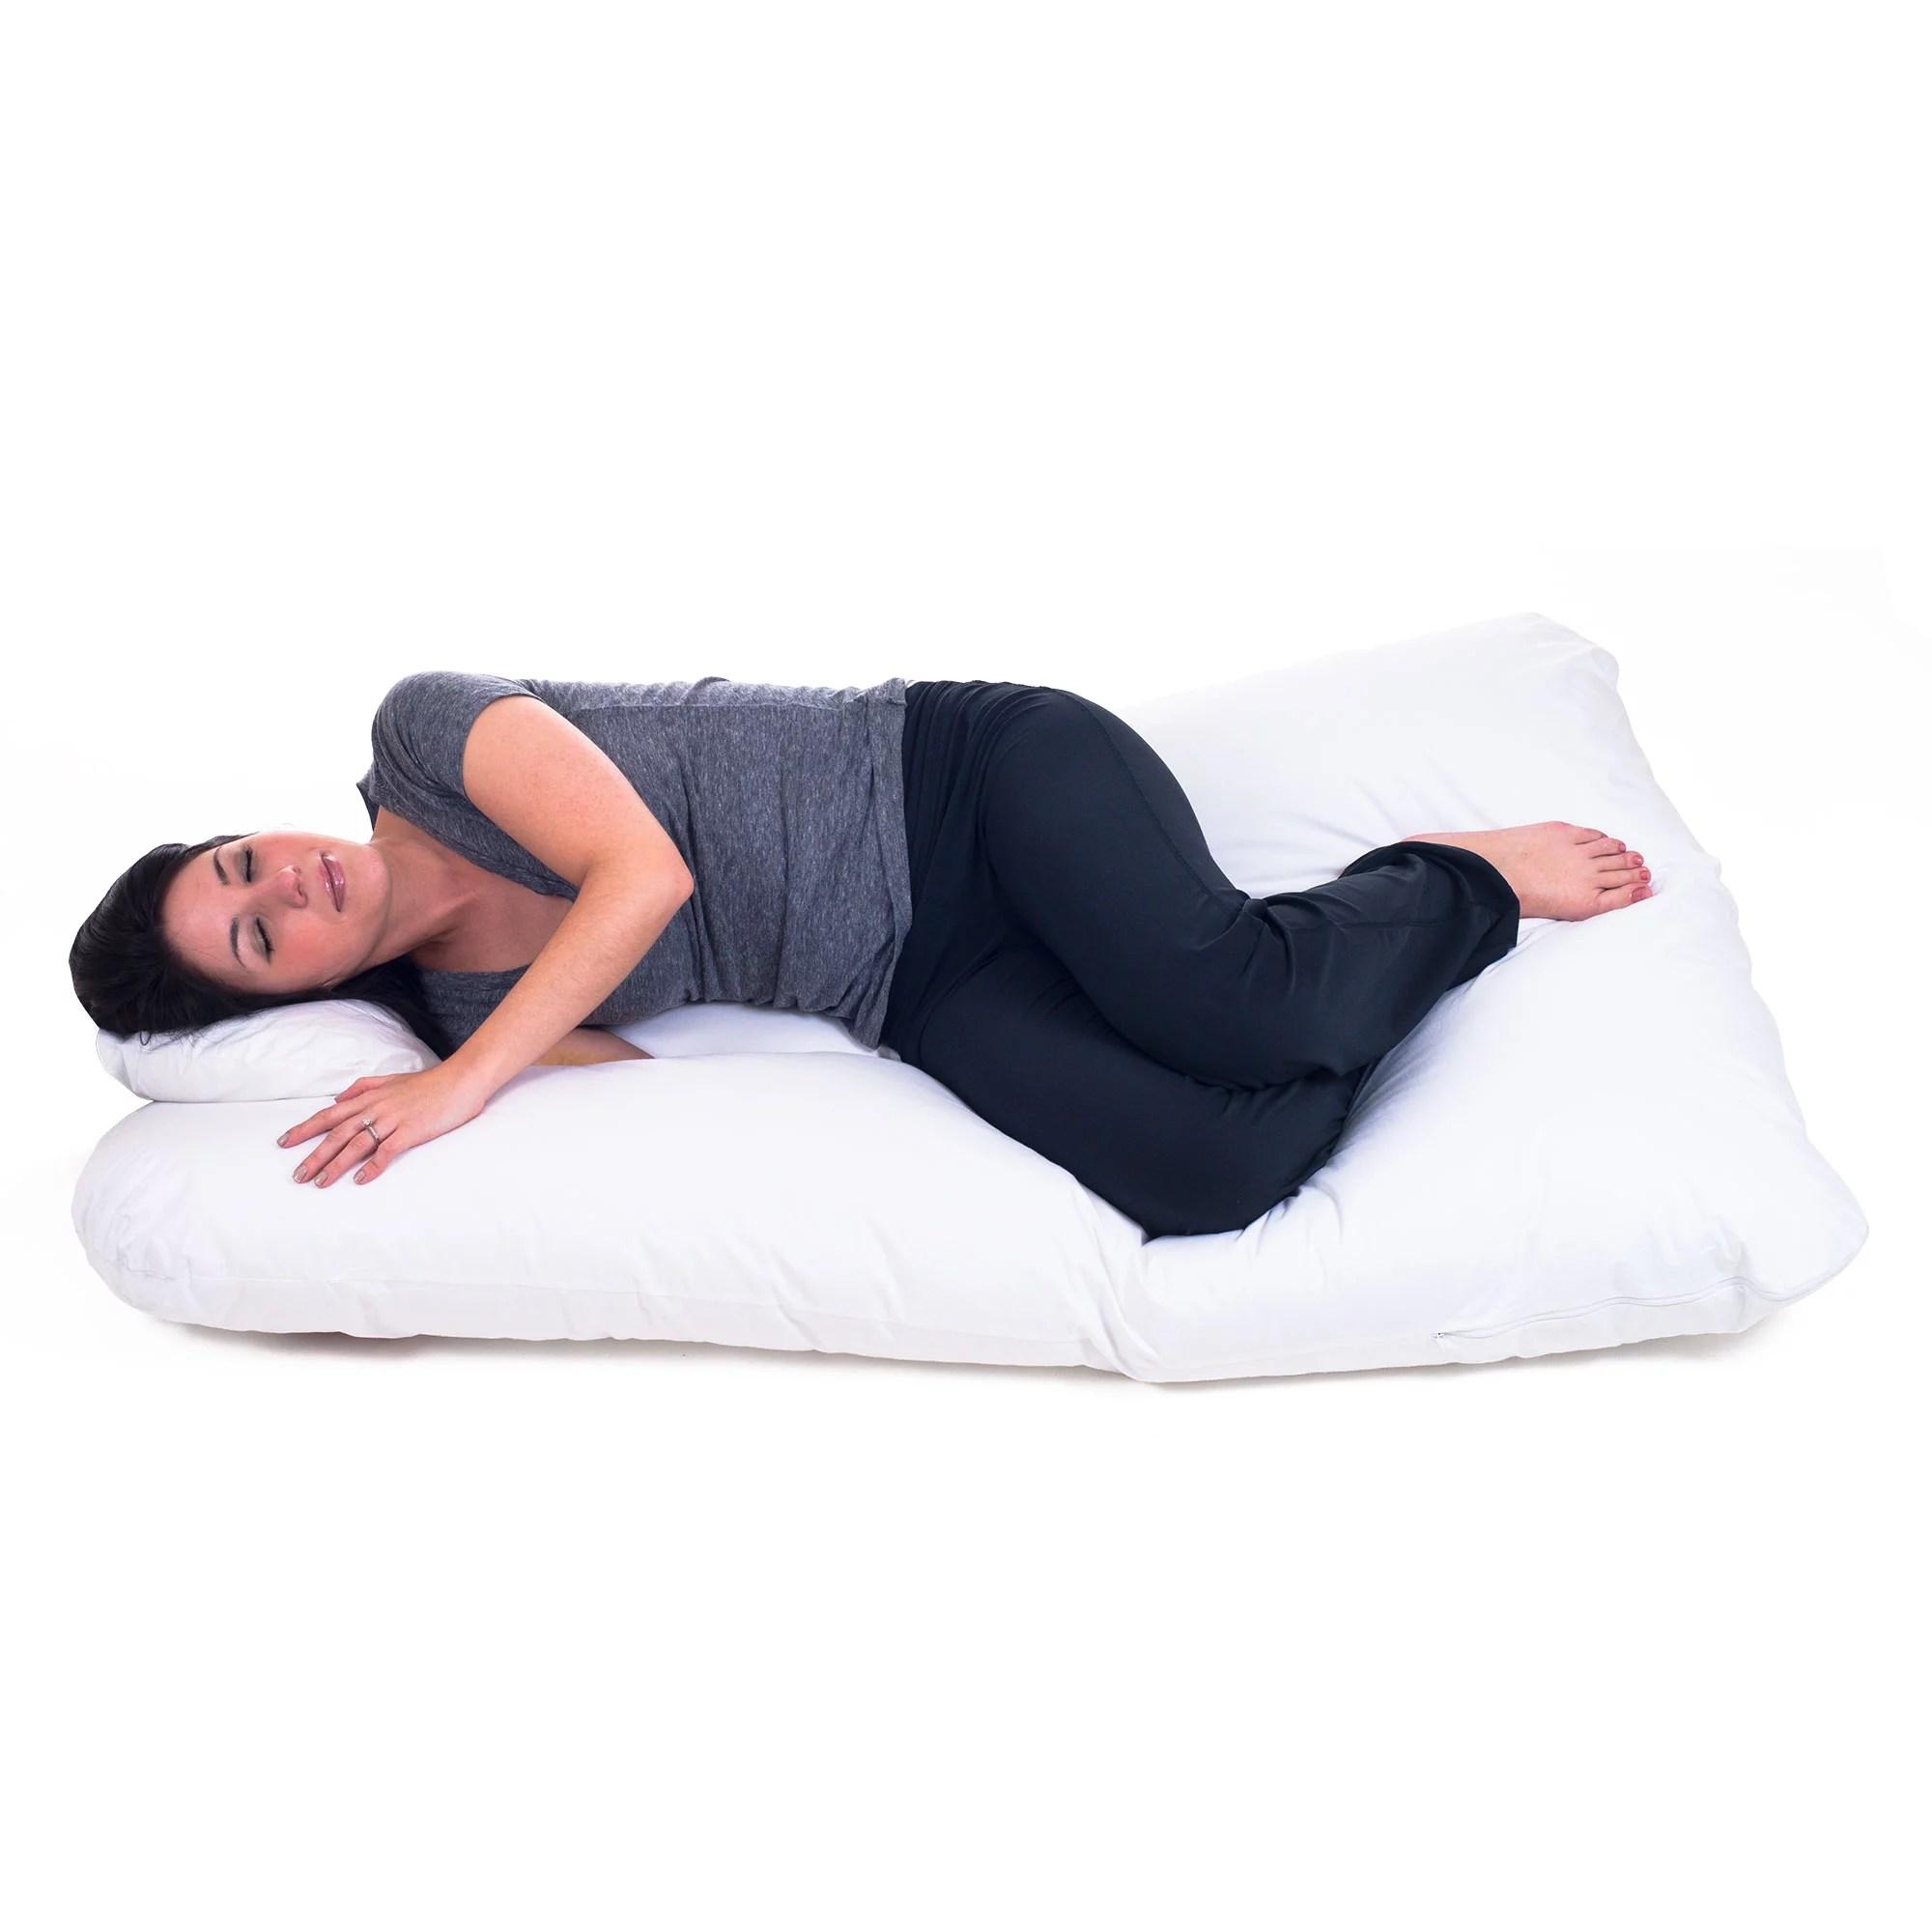 pregnancy pillow full body maternity pillow with contoured u shape by bluestone back support lavish home white 60 x 38 x 7 walmart com walmart com